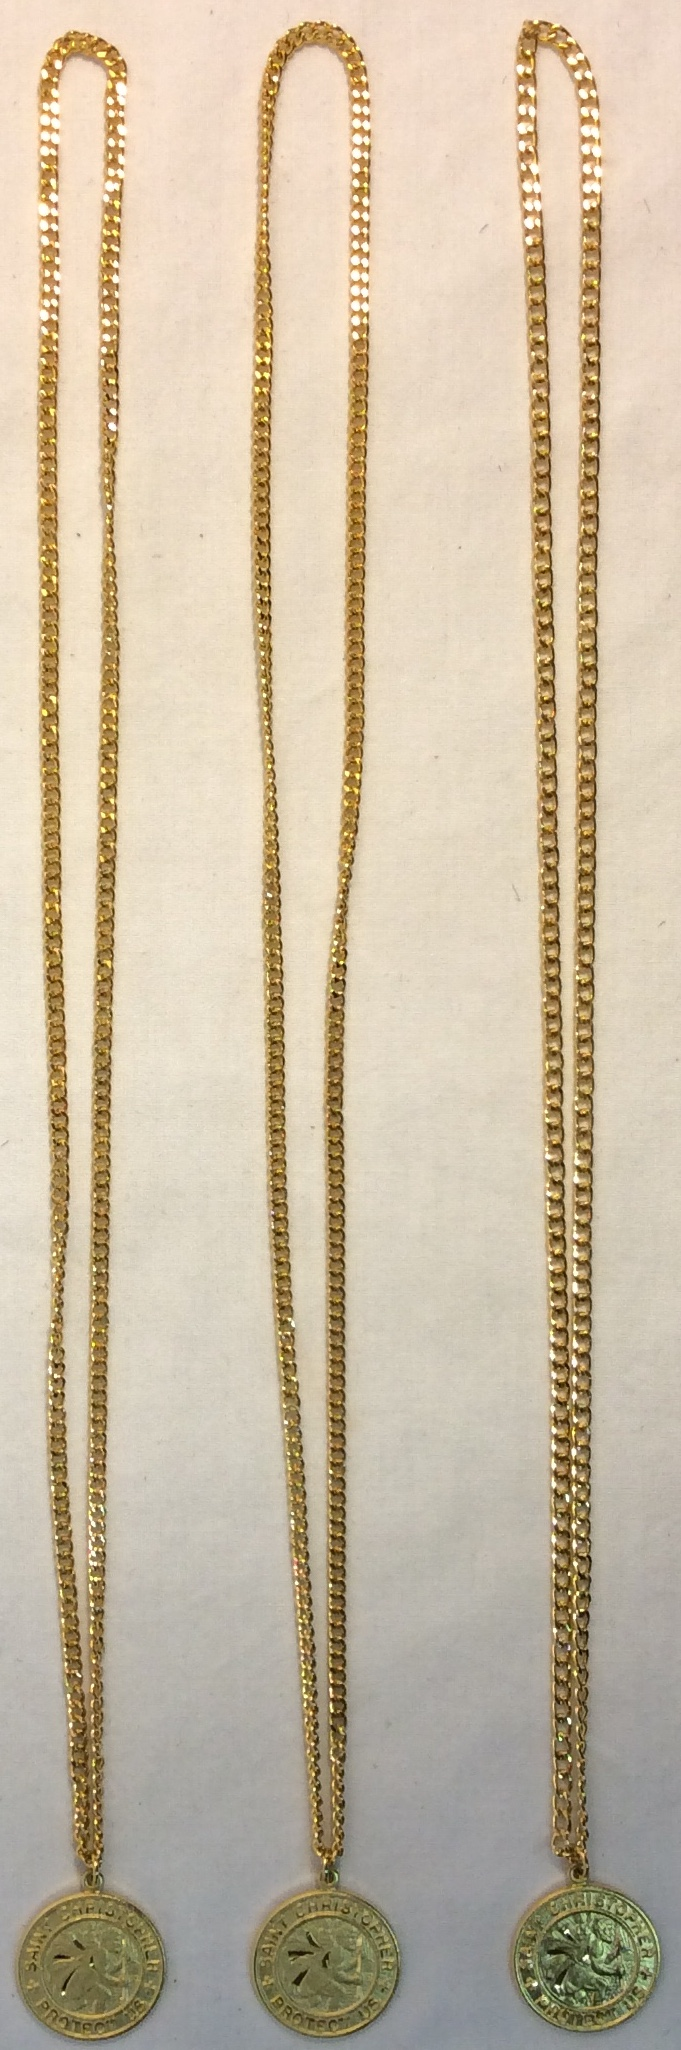 Golden St. Christopher pendants. One sided.